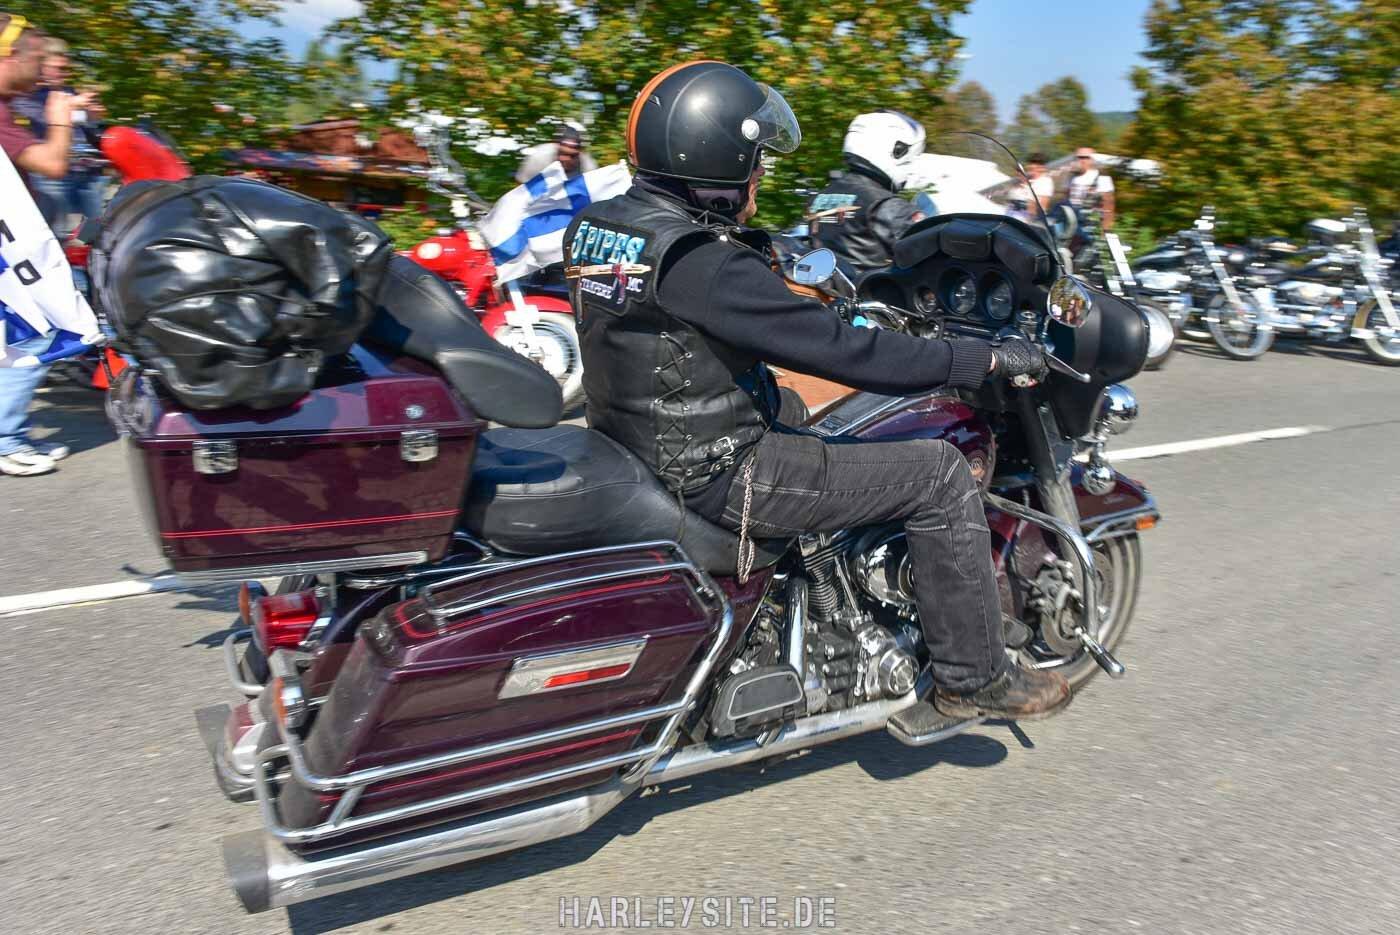 European-Bike-Week-9781